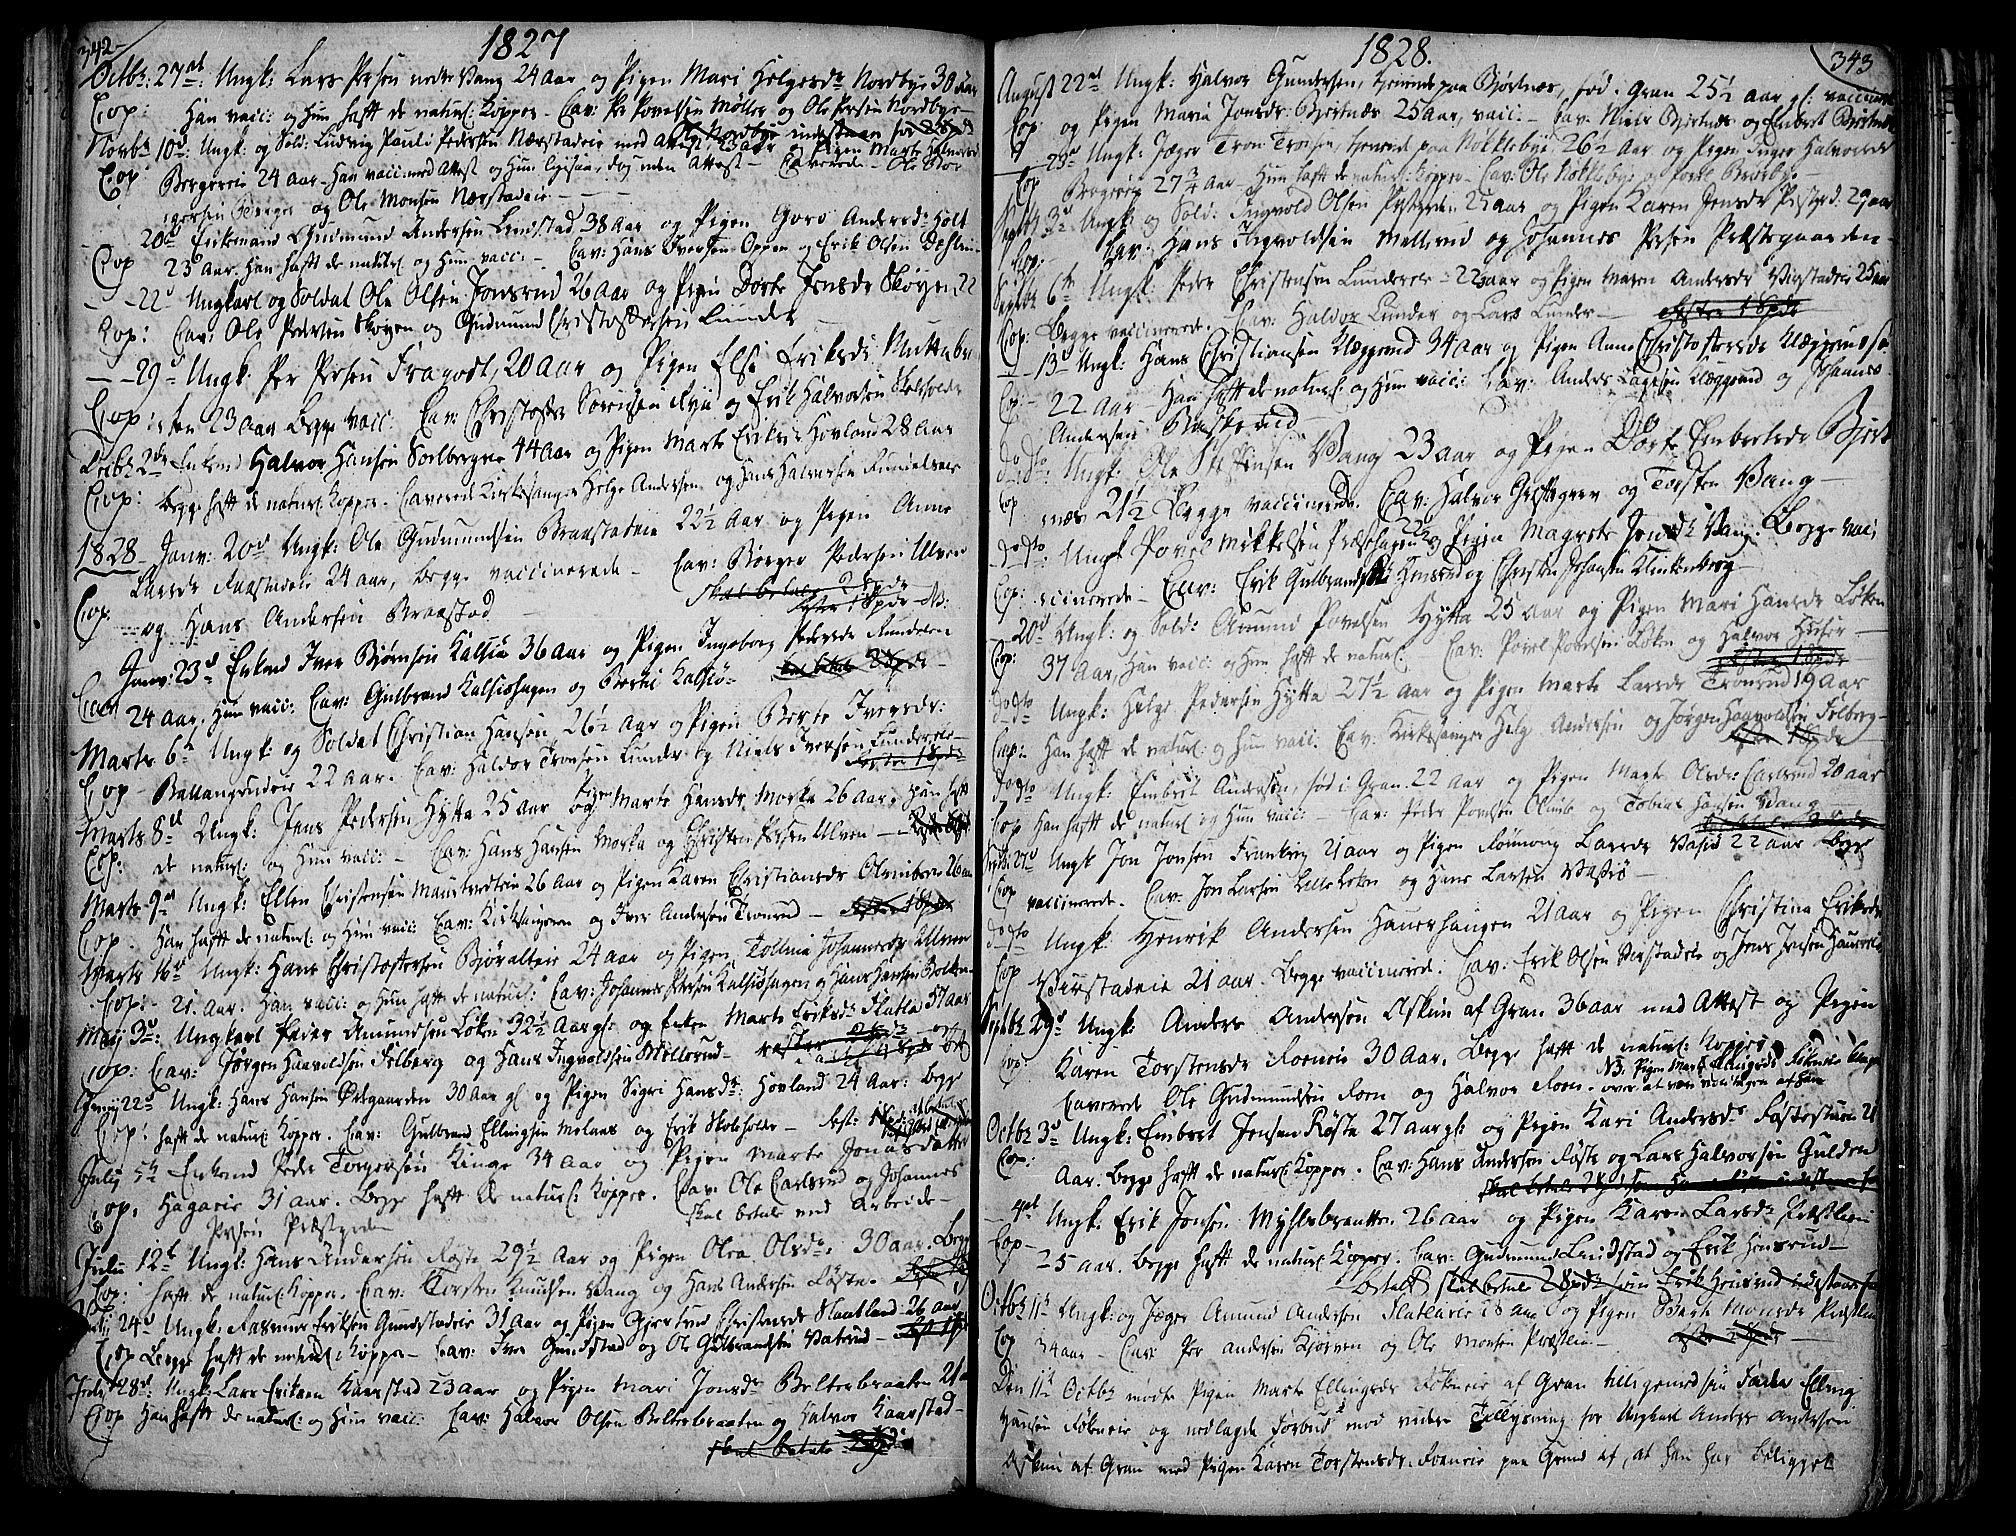 SAH, Jevnaker prestekontor, Ministerialbok nr. 4, 1800-1861, s. 342-343